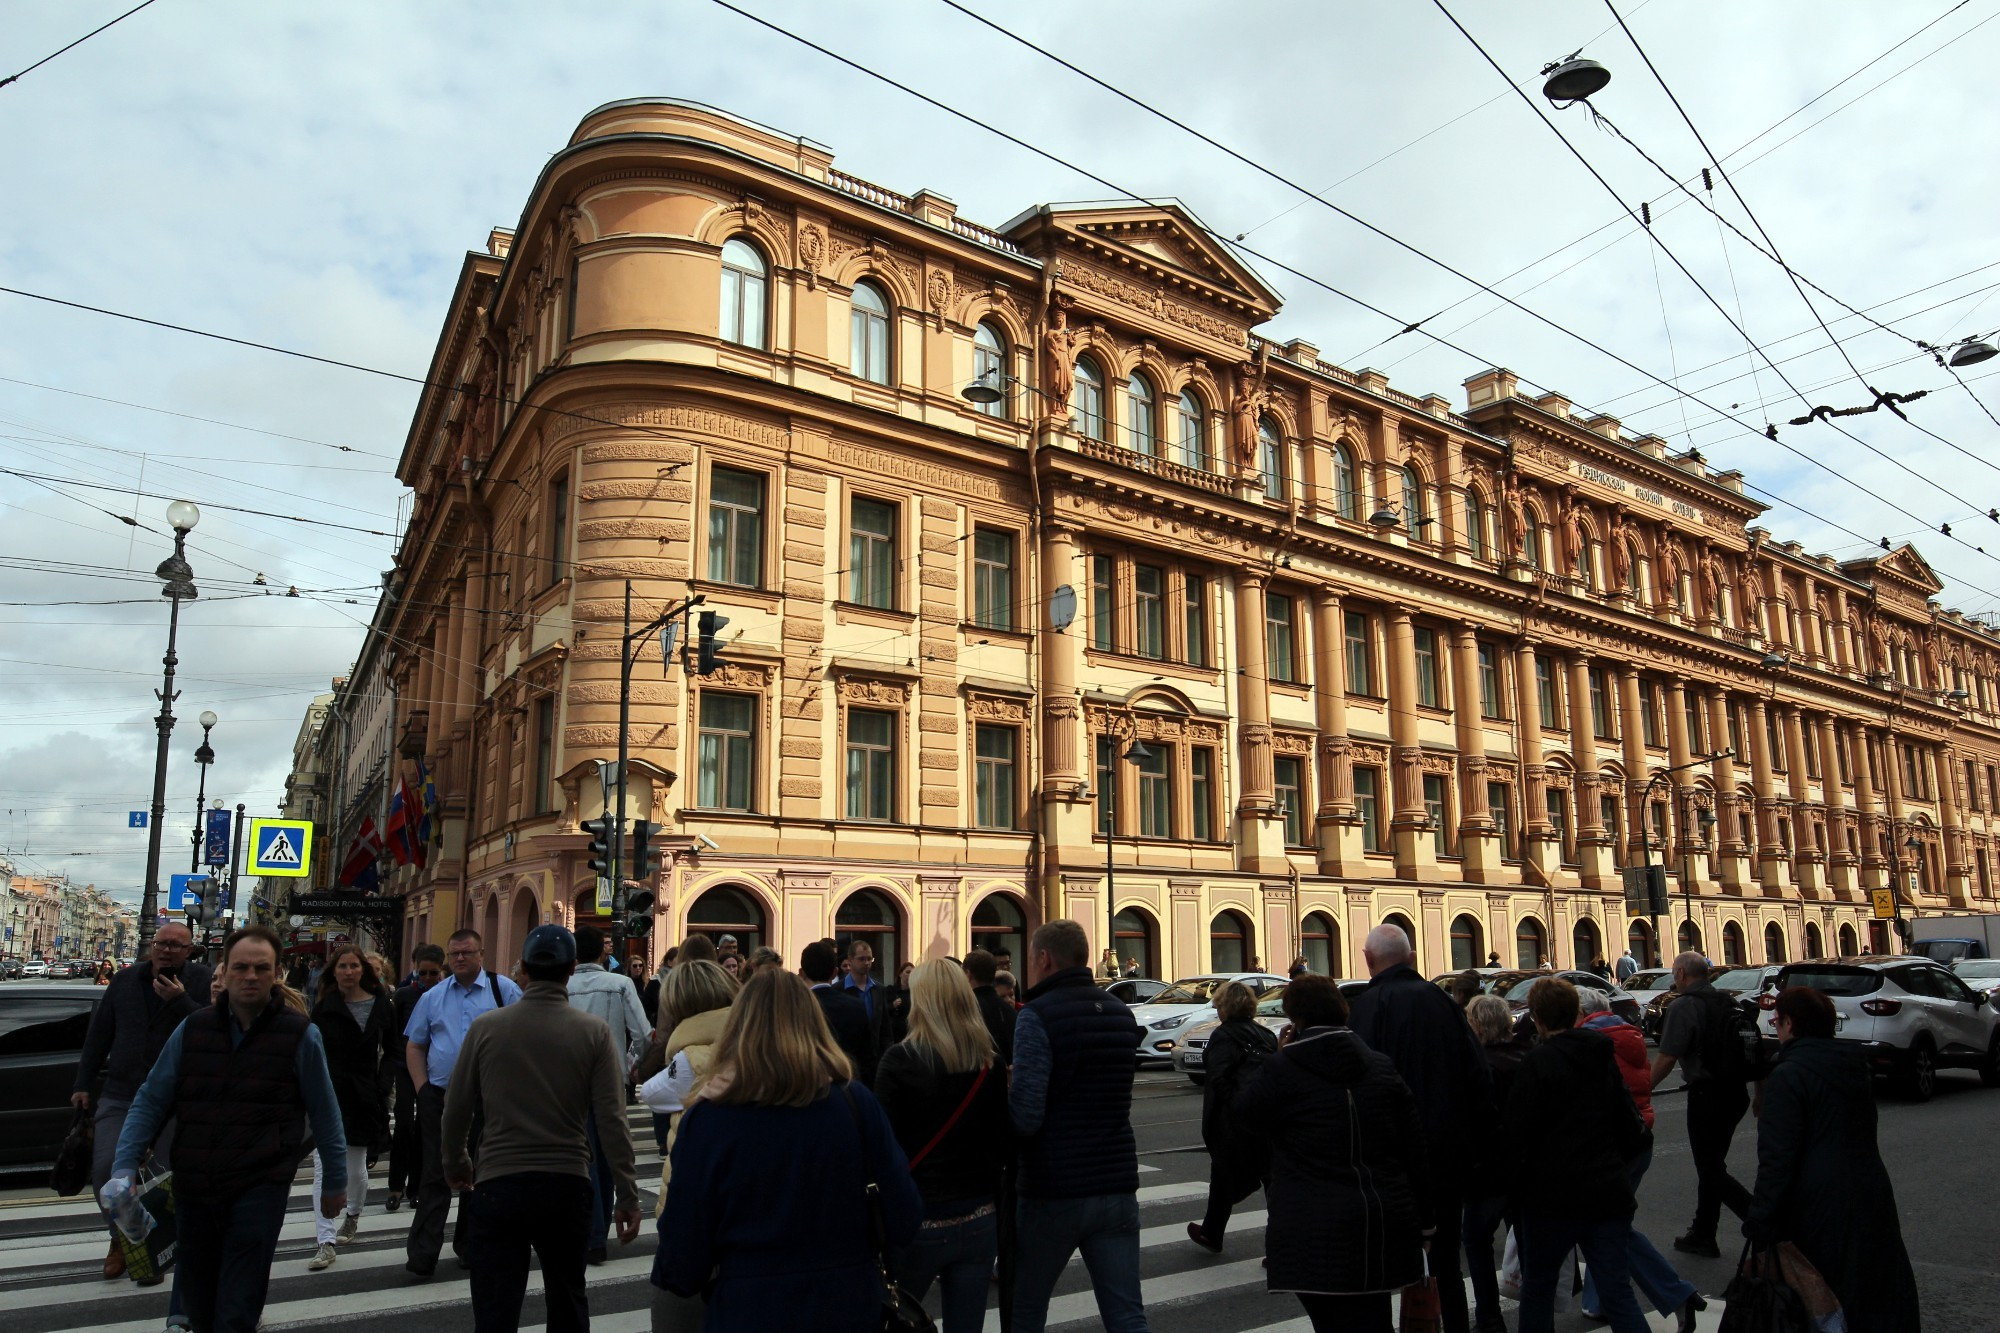 невский проспект 49 гостиница Radisson бывший Сайгон